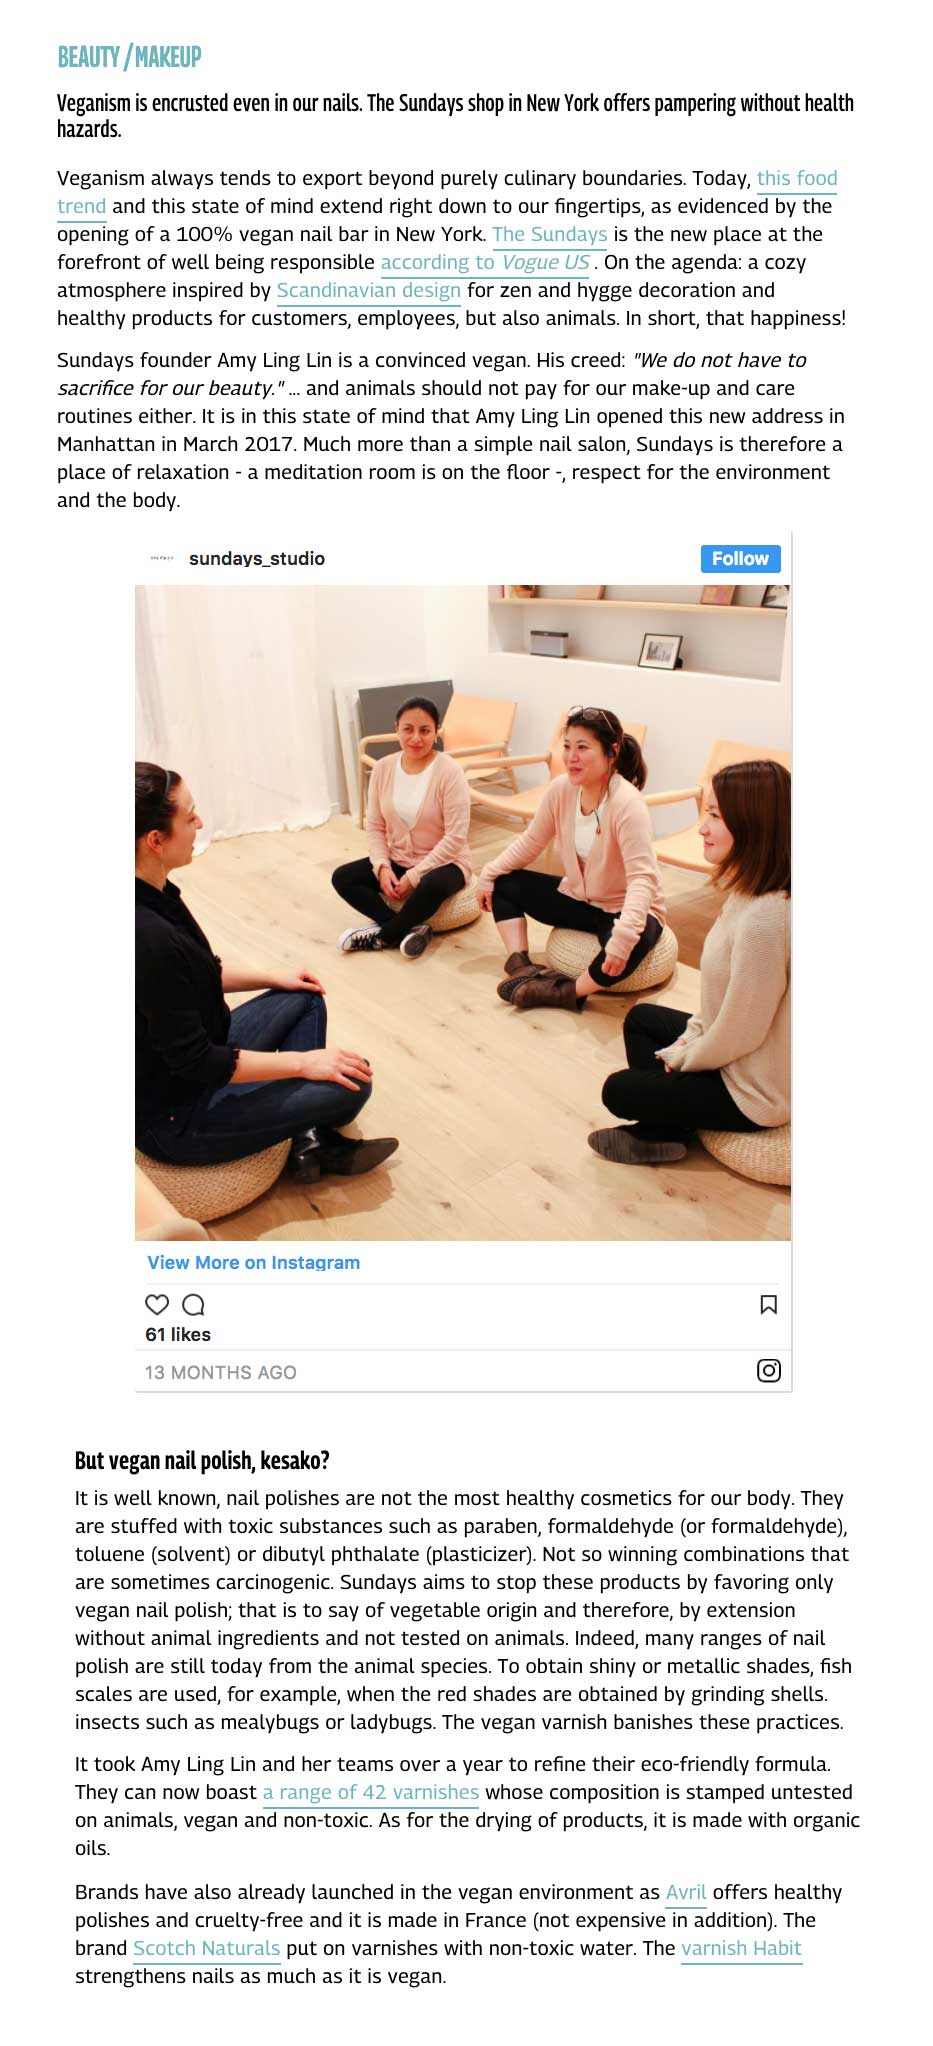 Grazia-article-english.jpg